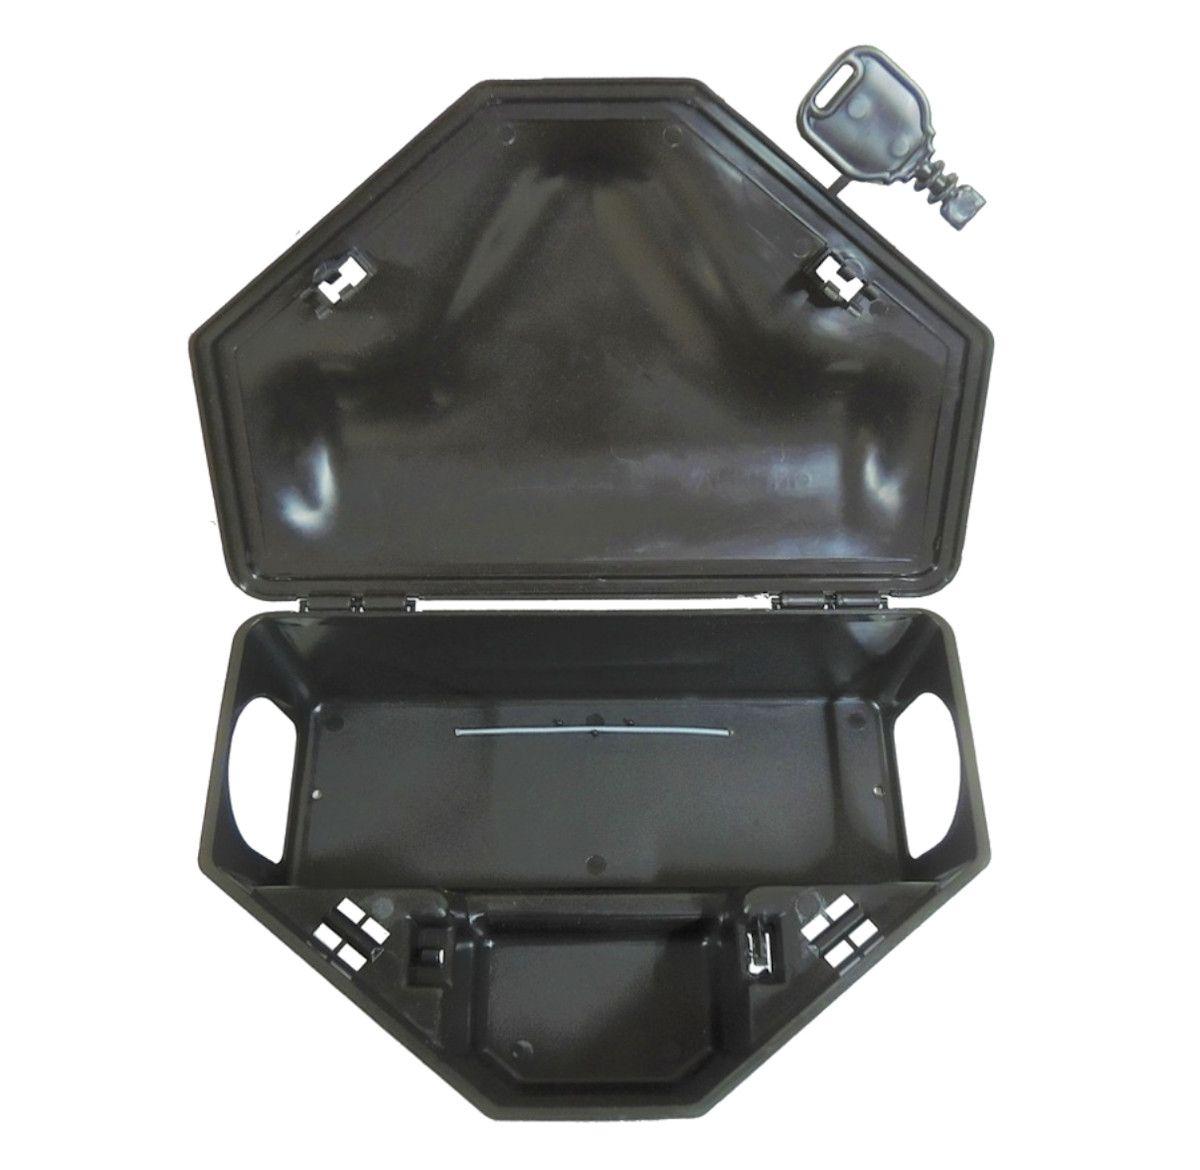 Kit 16 Porta Isca Com 2 Chaves - Duplo Travamento